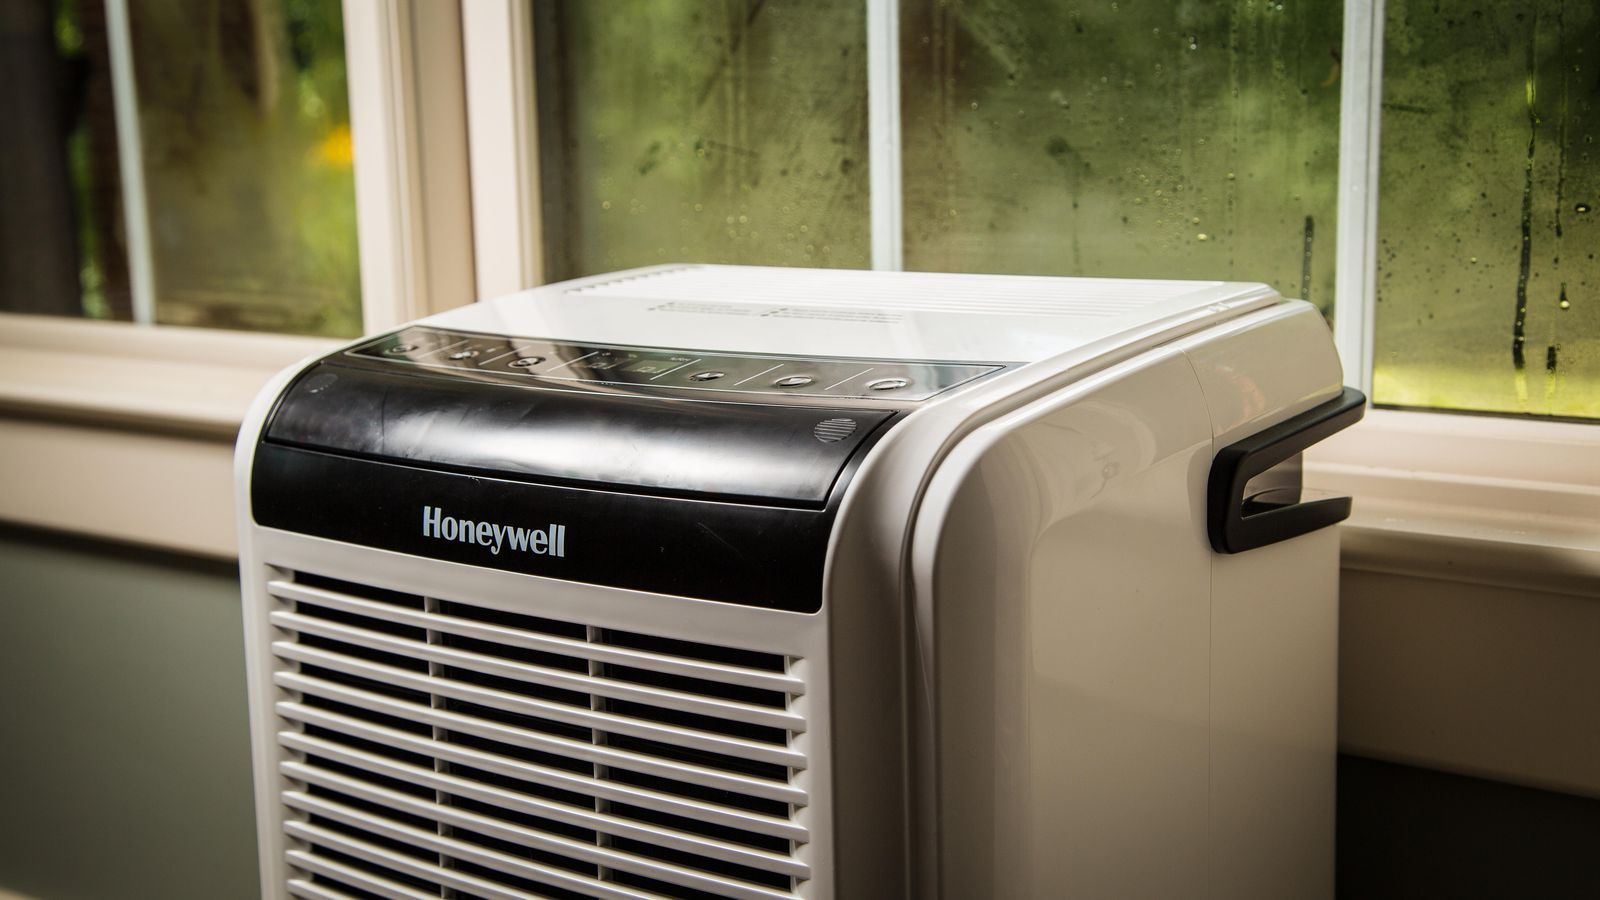 Honeywell Dehumidifier